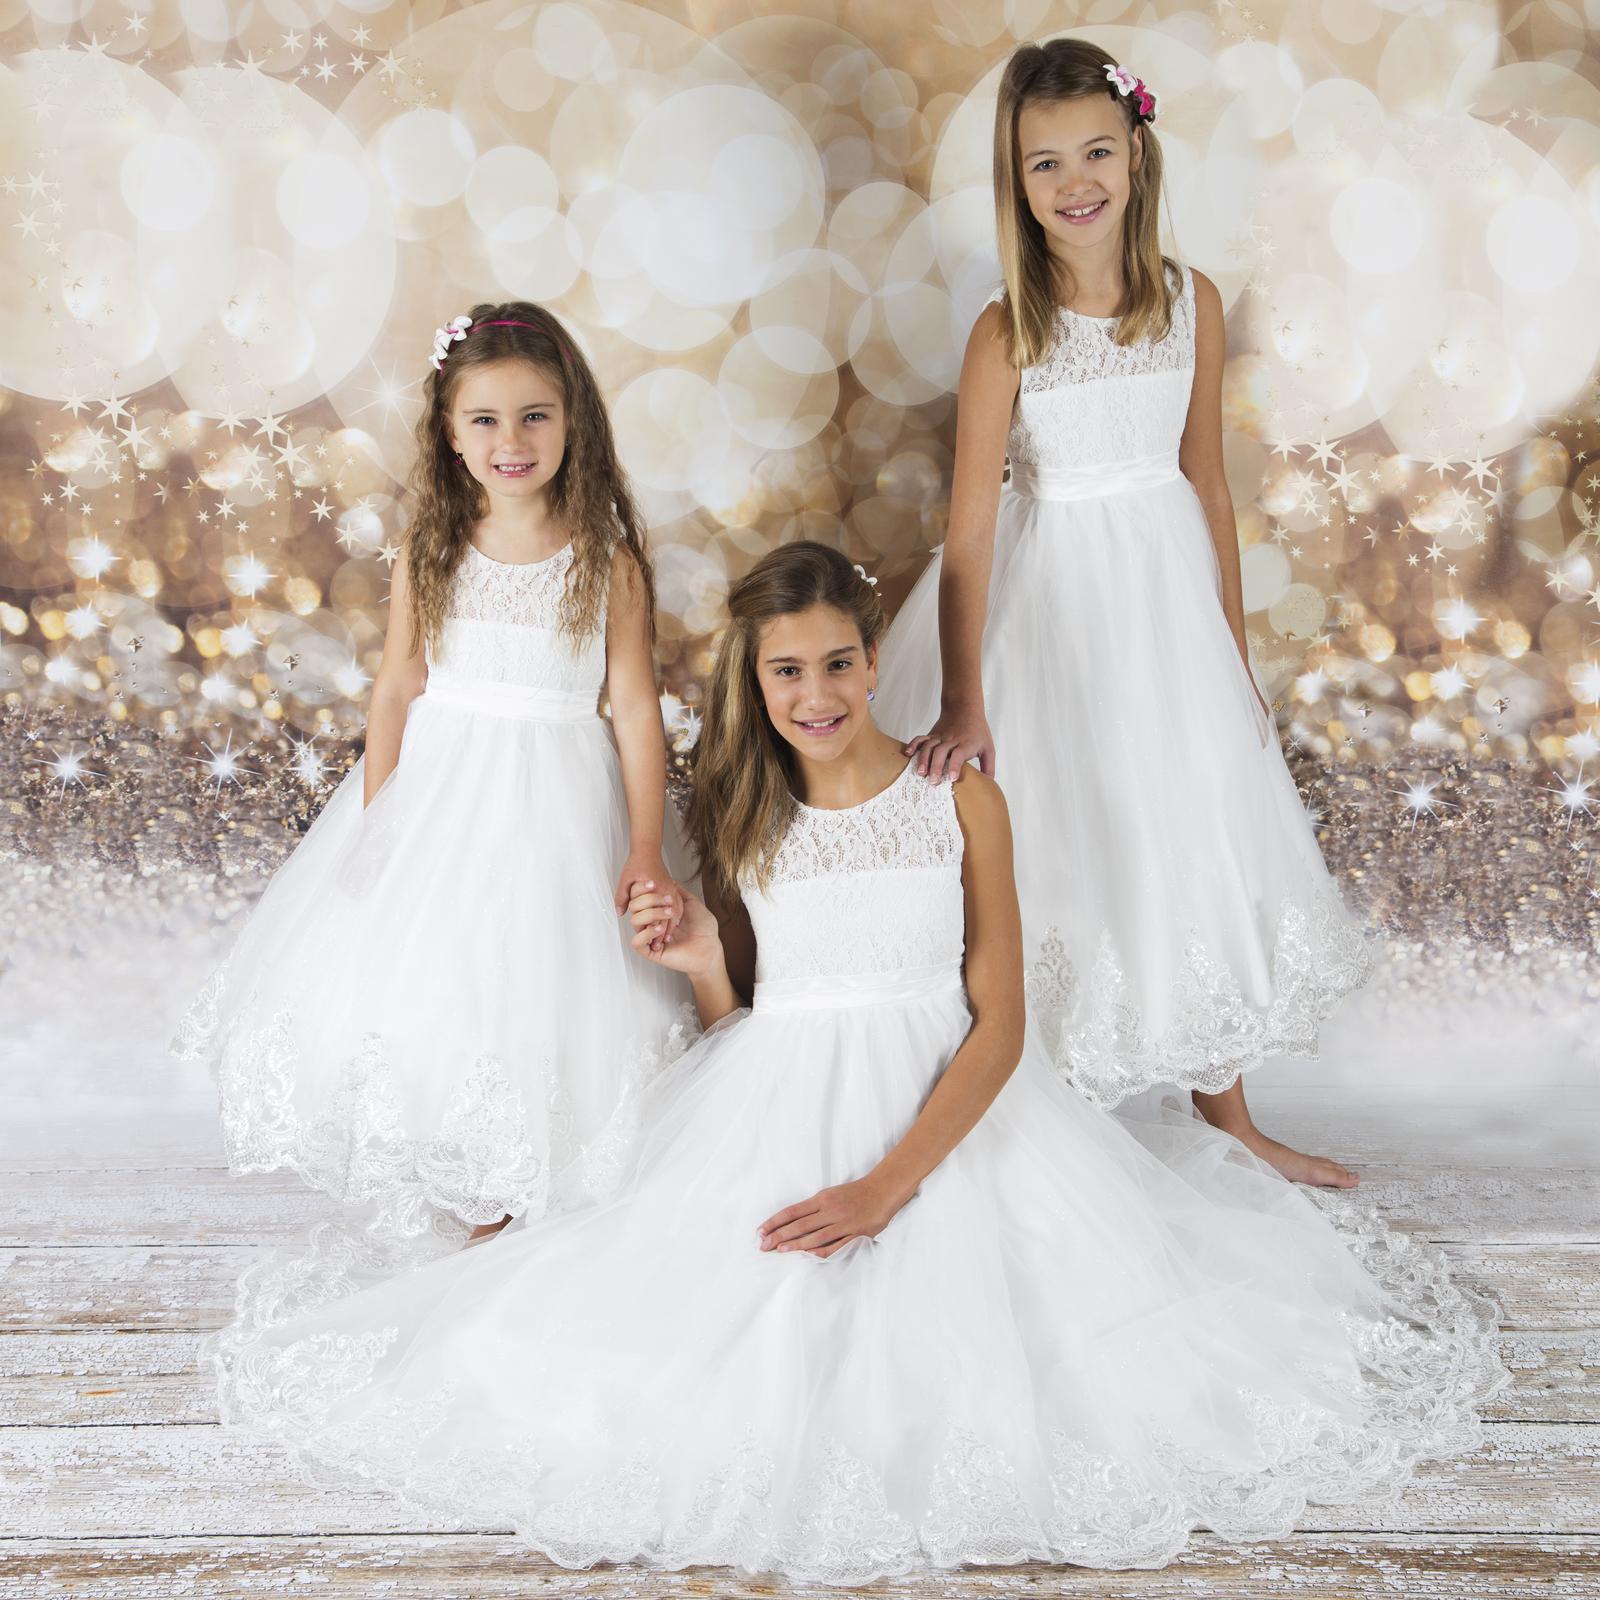 Šaty Isabel - Obrázek č. 4